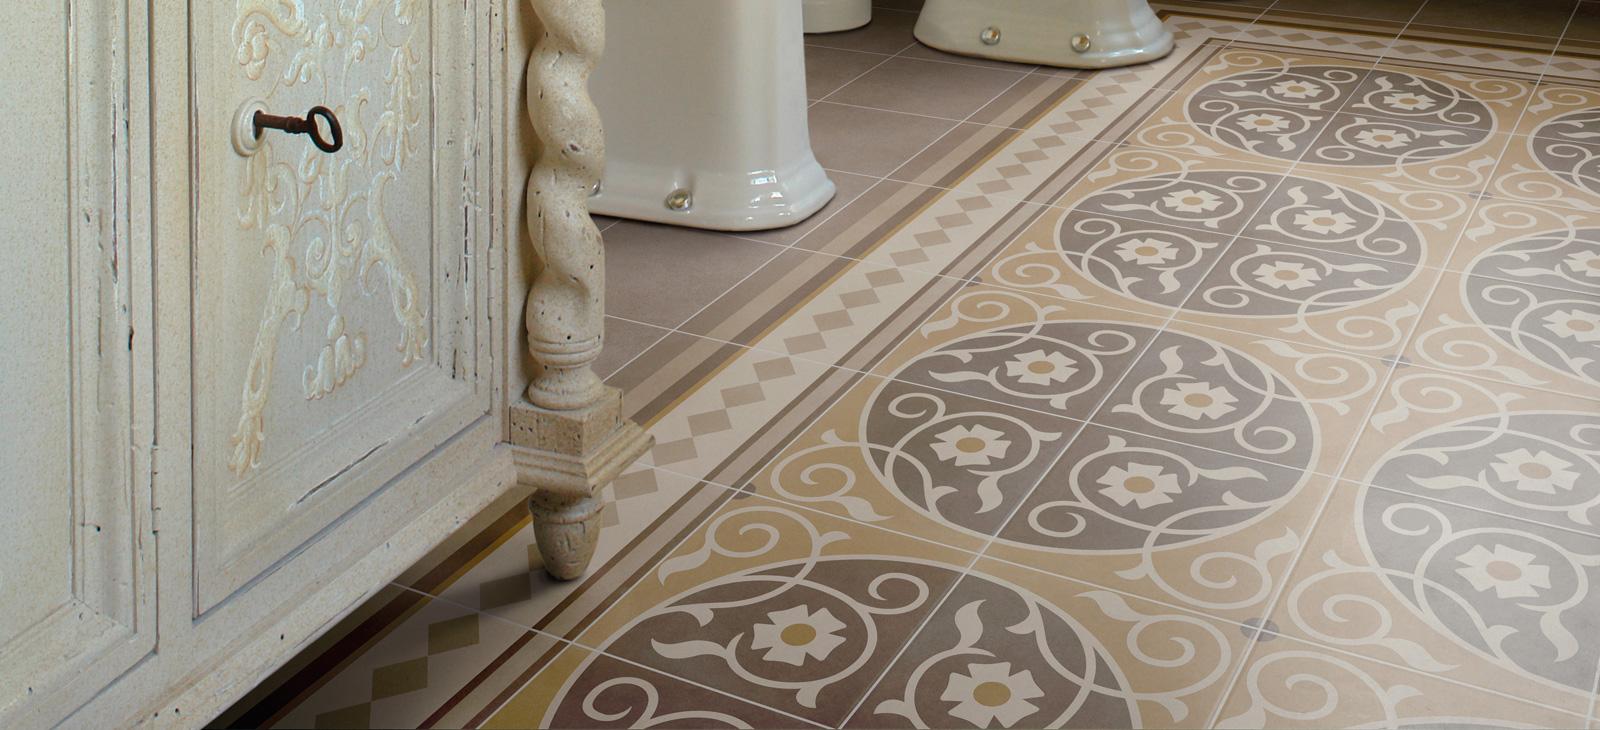 Capital Encaustic Effect Tiles